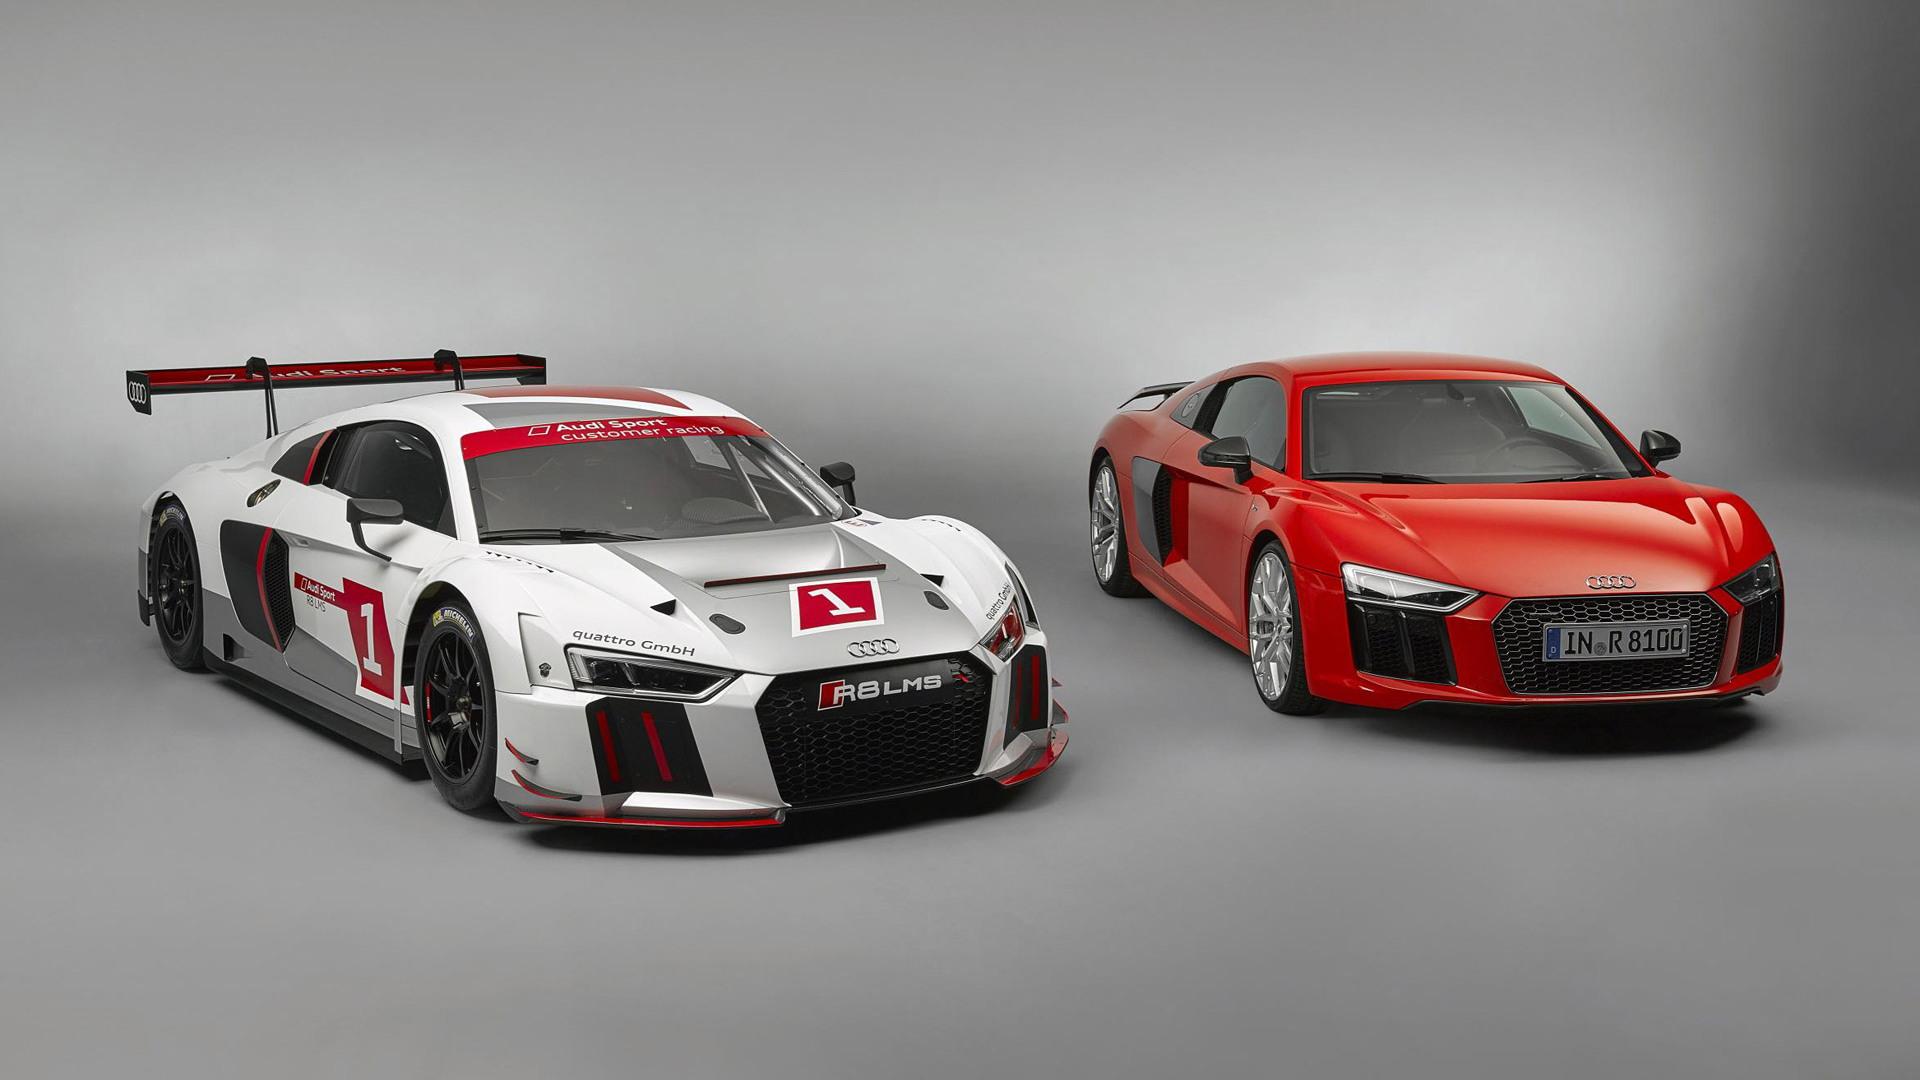 2016 Audi R8 LMS race car and 2017 R8